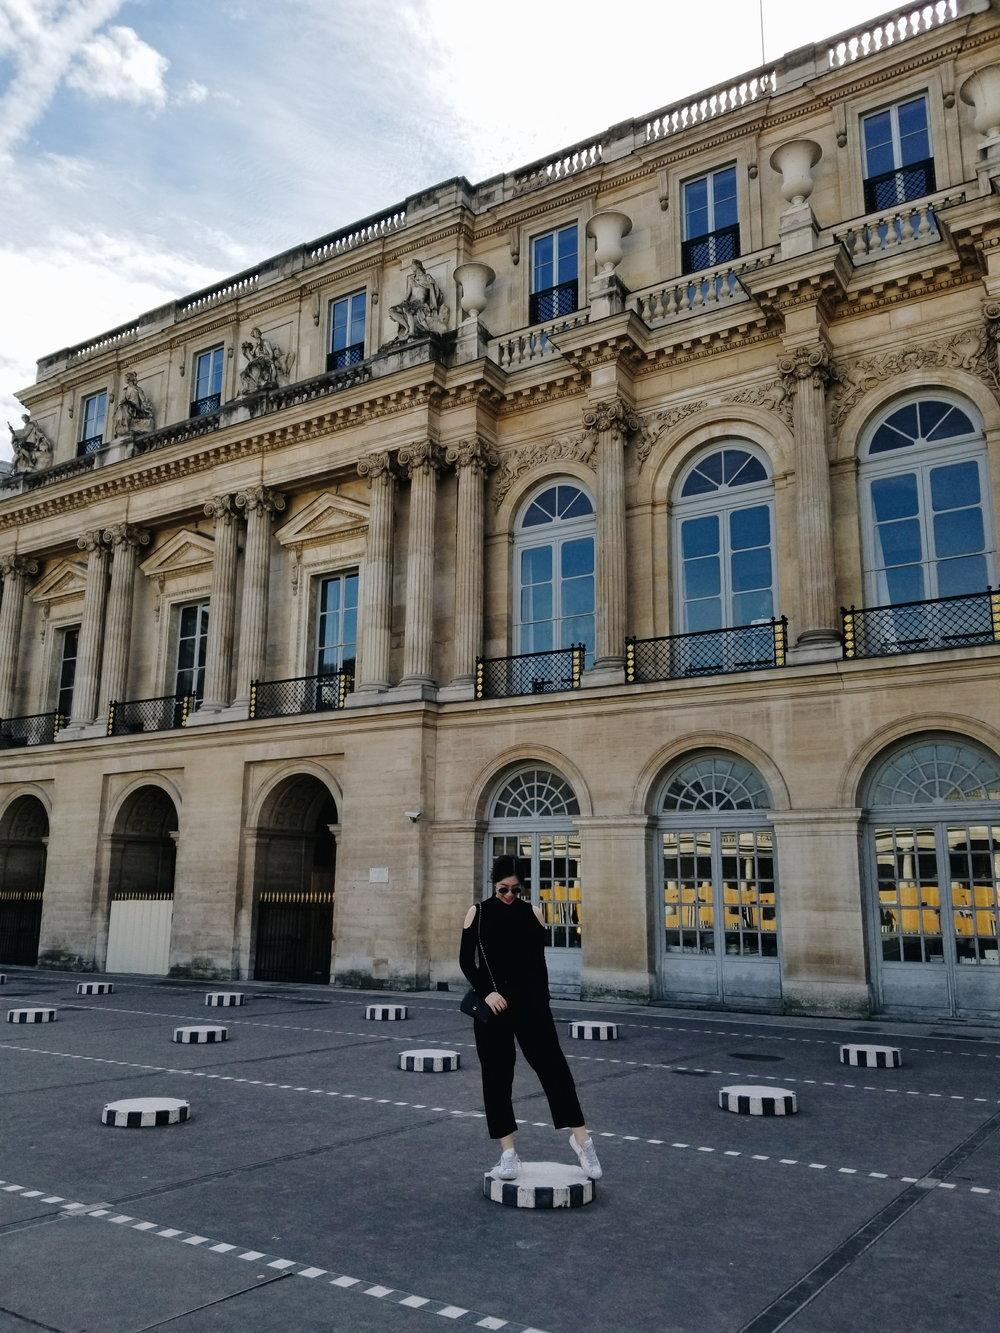 postcards-from-paris-palais-de-royal-03.jpg